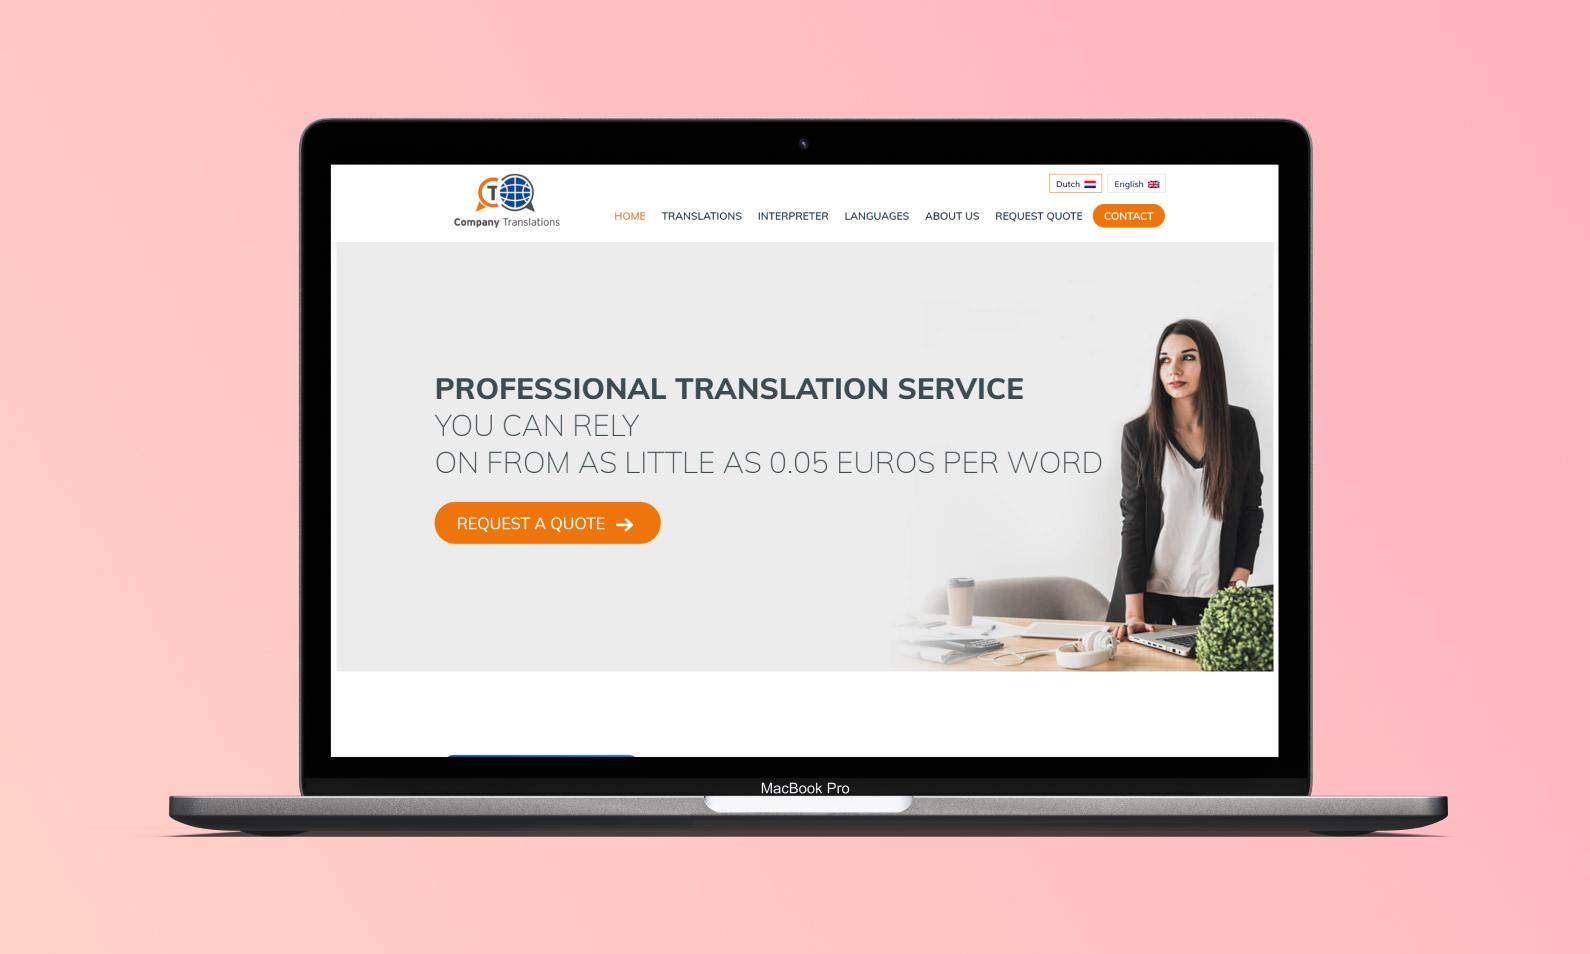 Company Translation